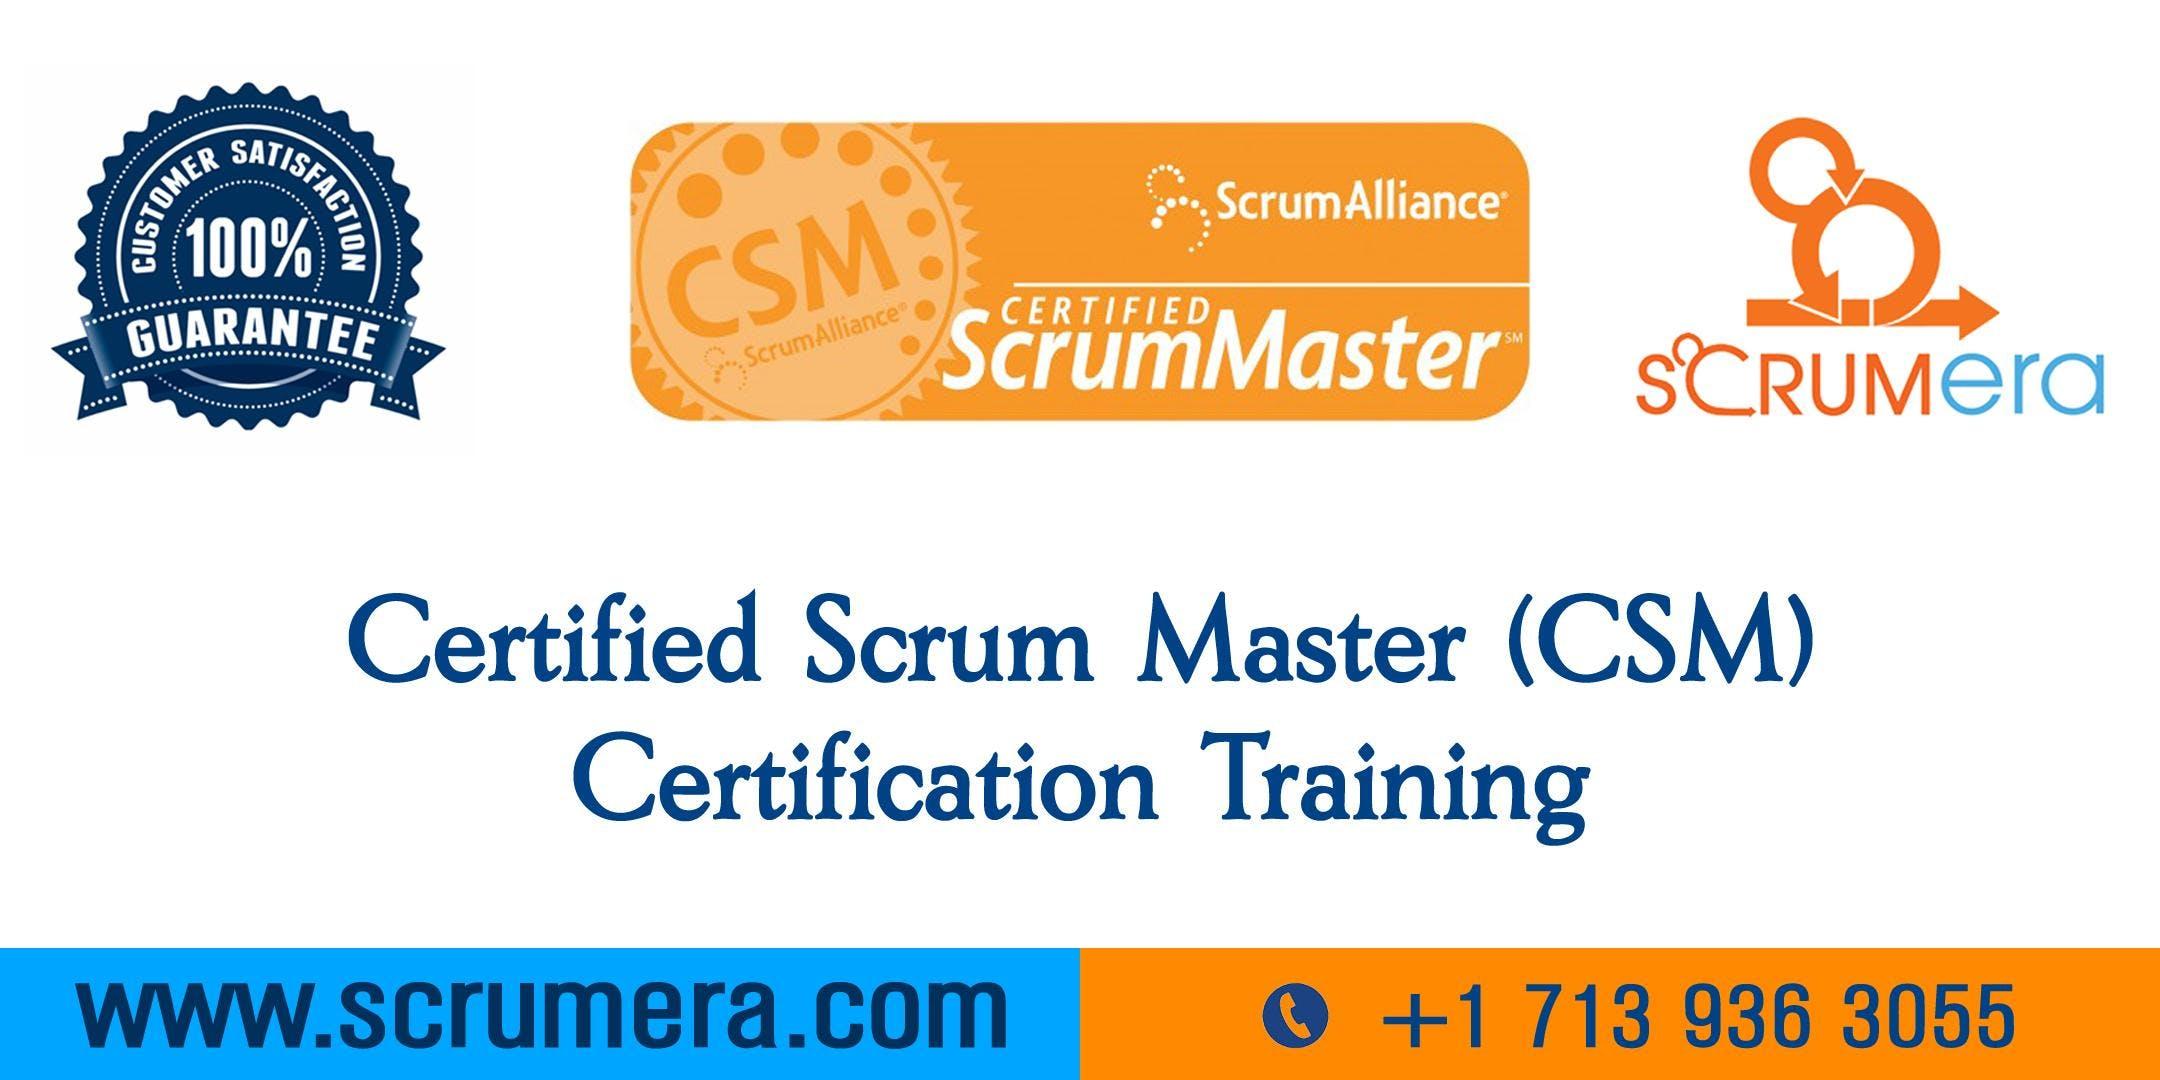 Scrum Master Certification | CSM Training | CSM Certification Workshop | Certified Scrum Master (CSM) Training in Arvada, CO | ScrumERA